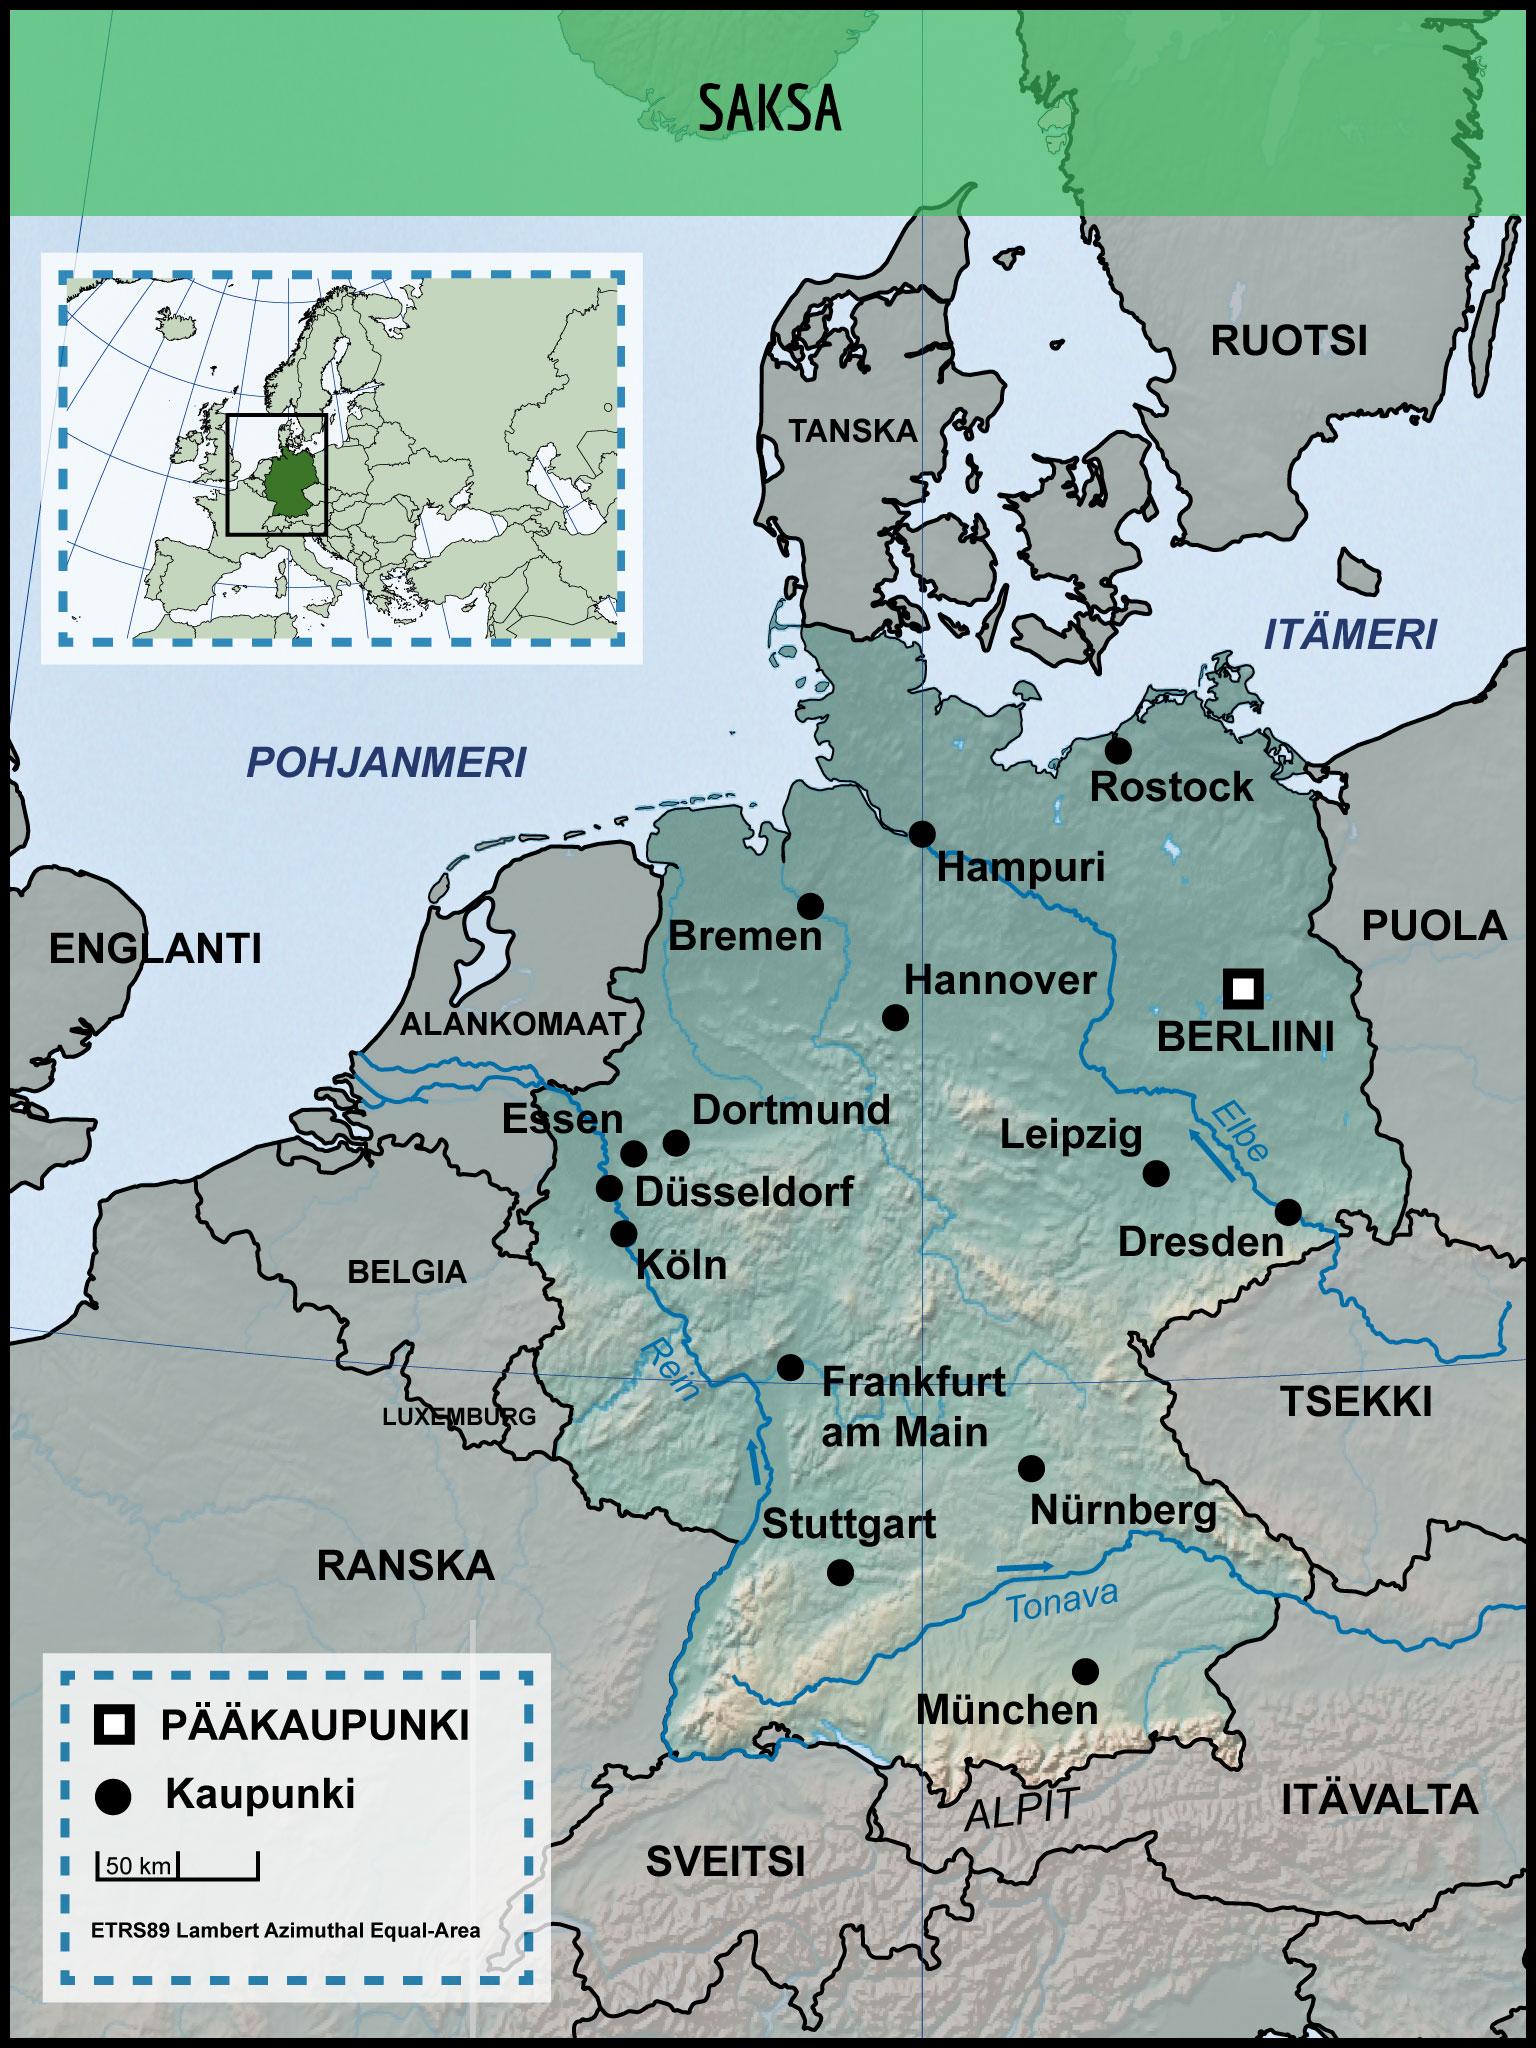 Saksan Kartta